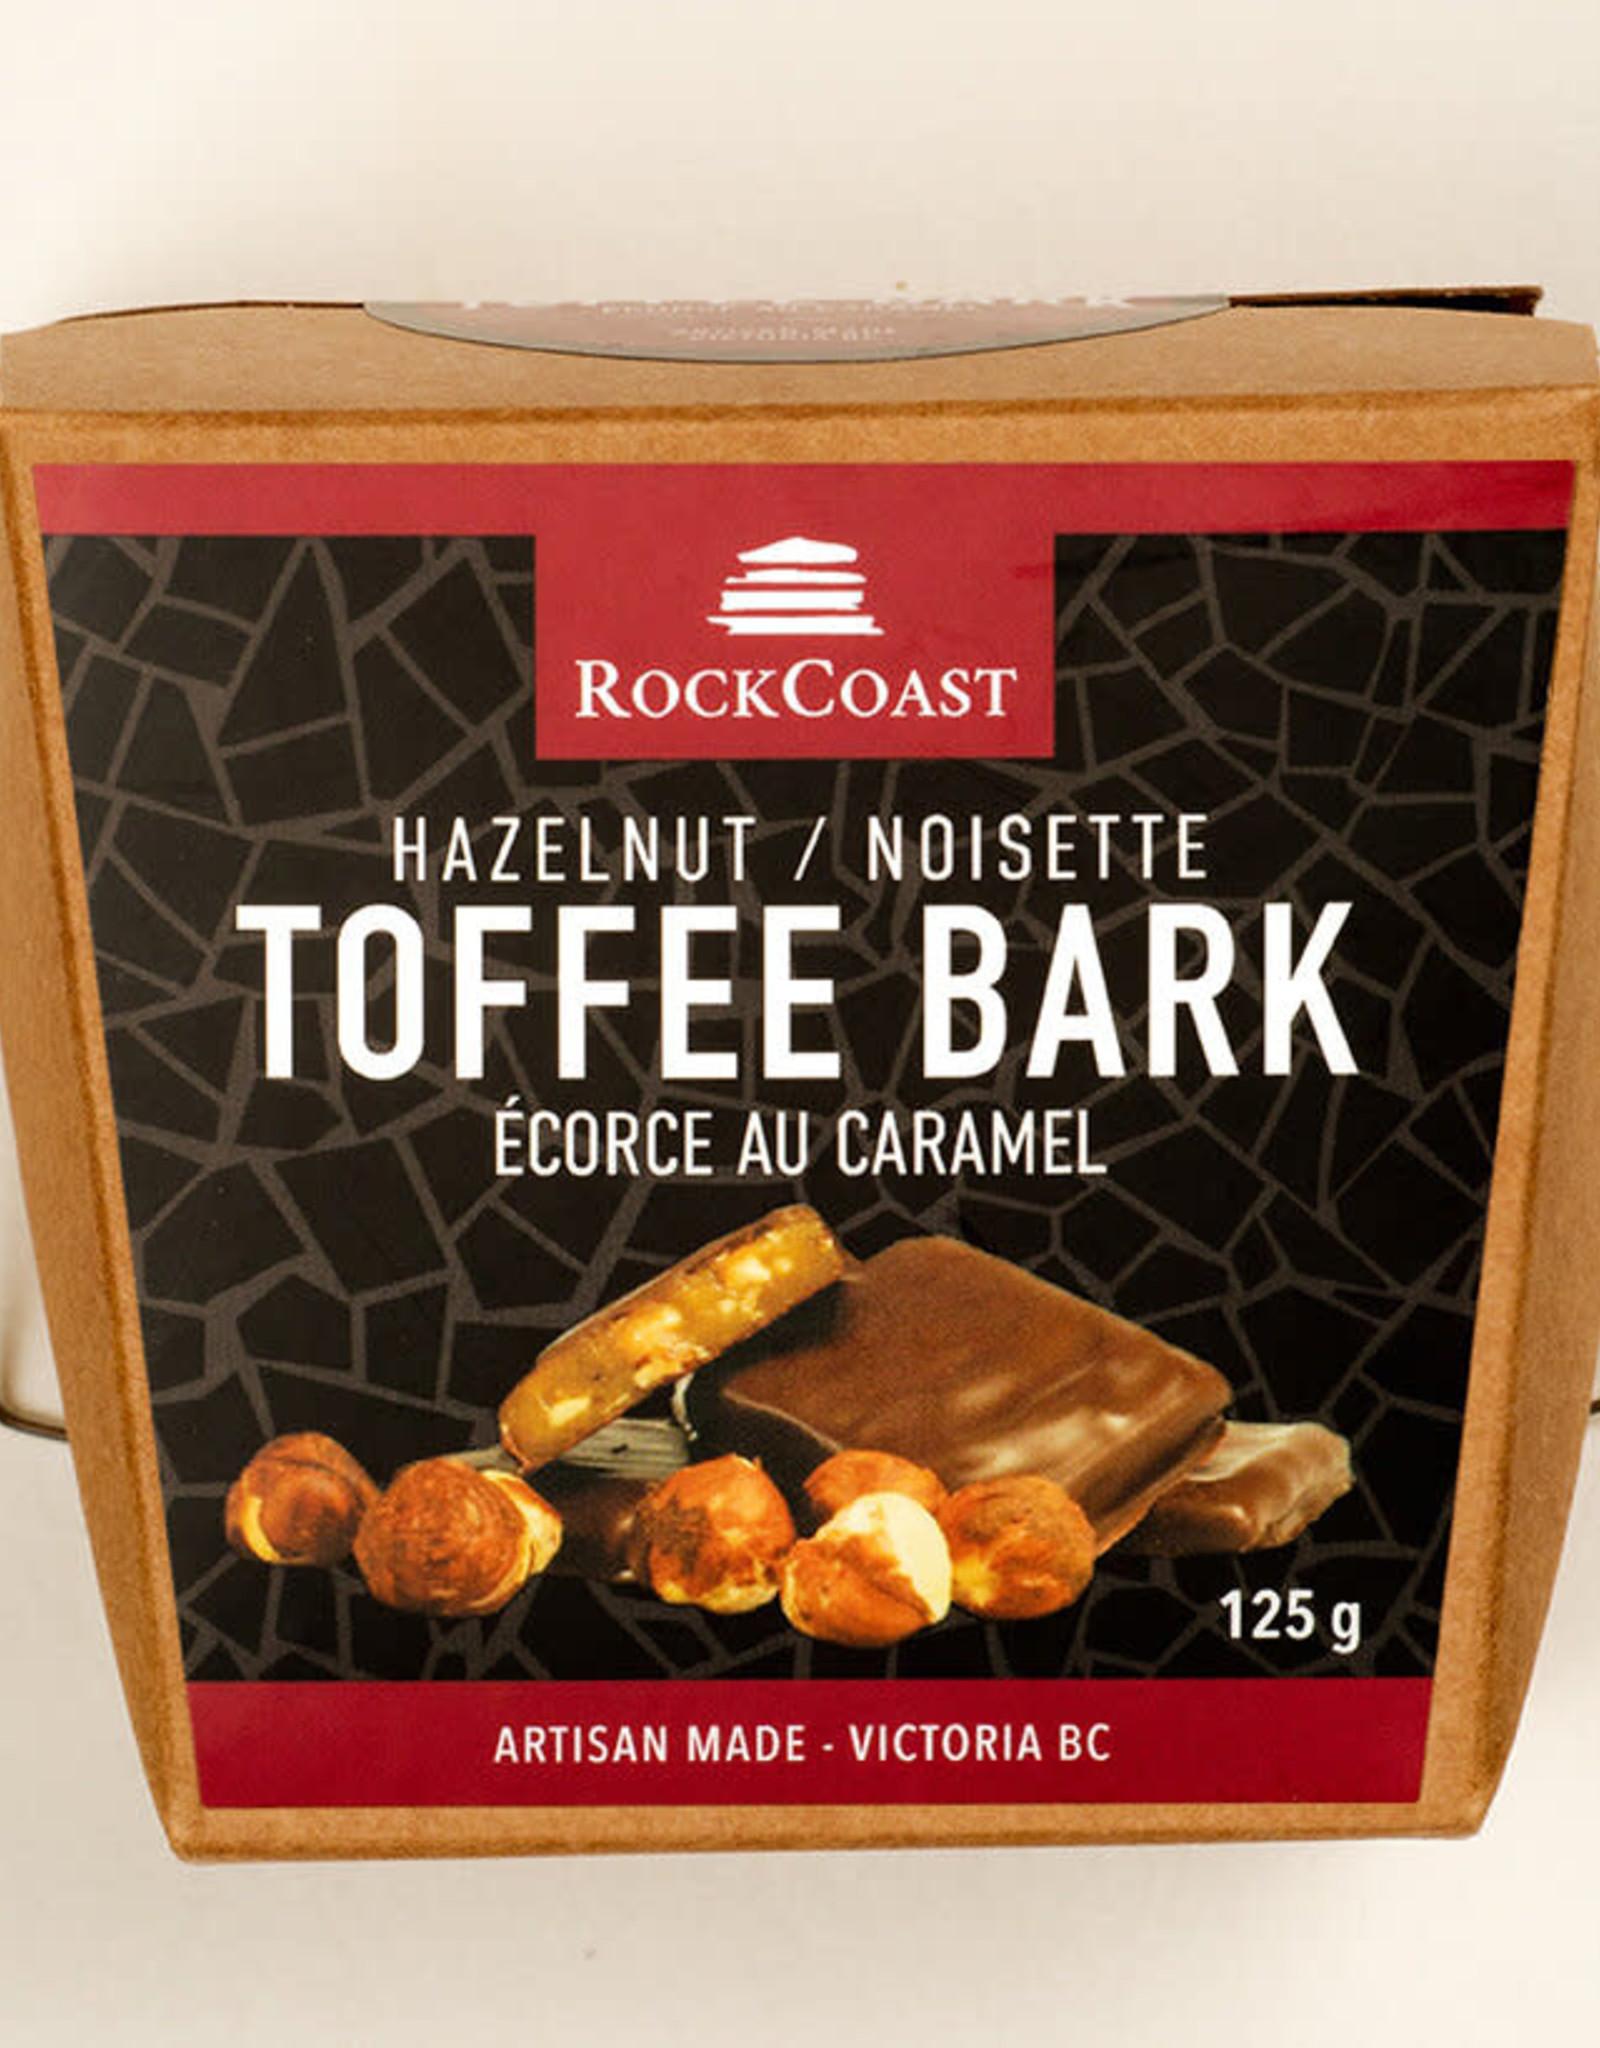 Rock Coast Toffee bark - Hazelnut 125g box